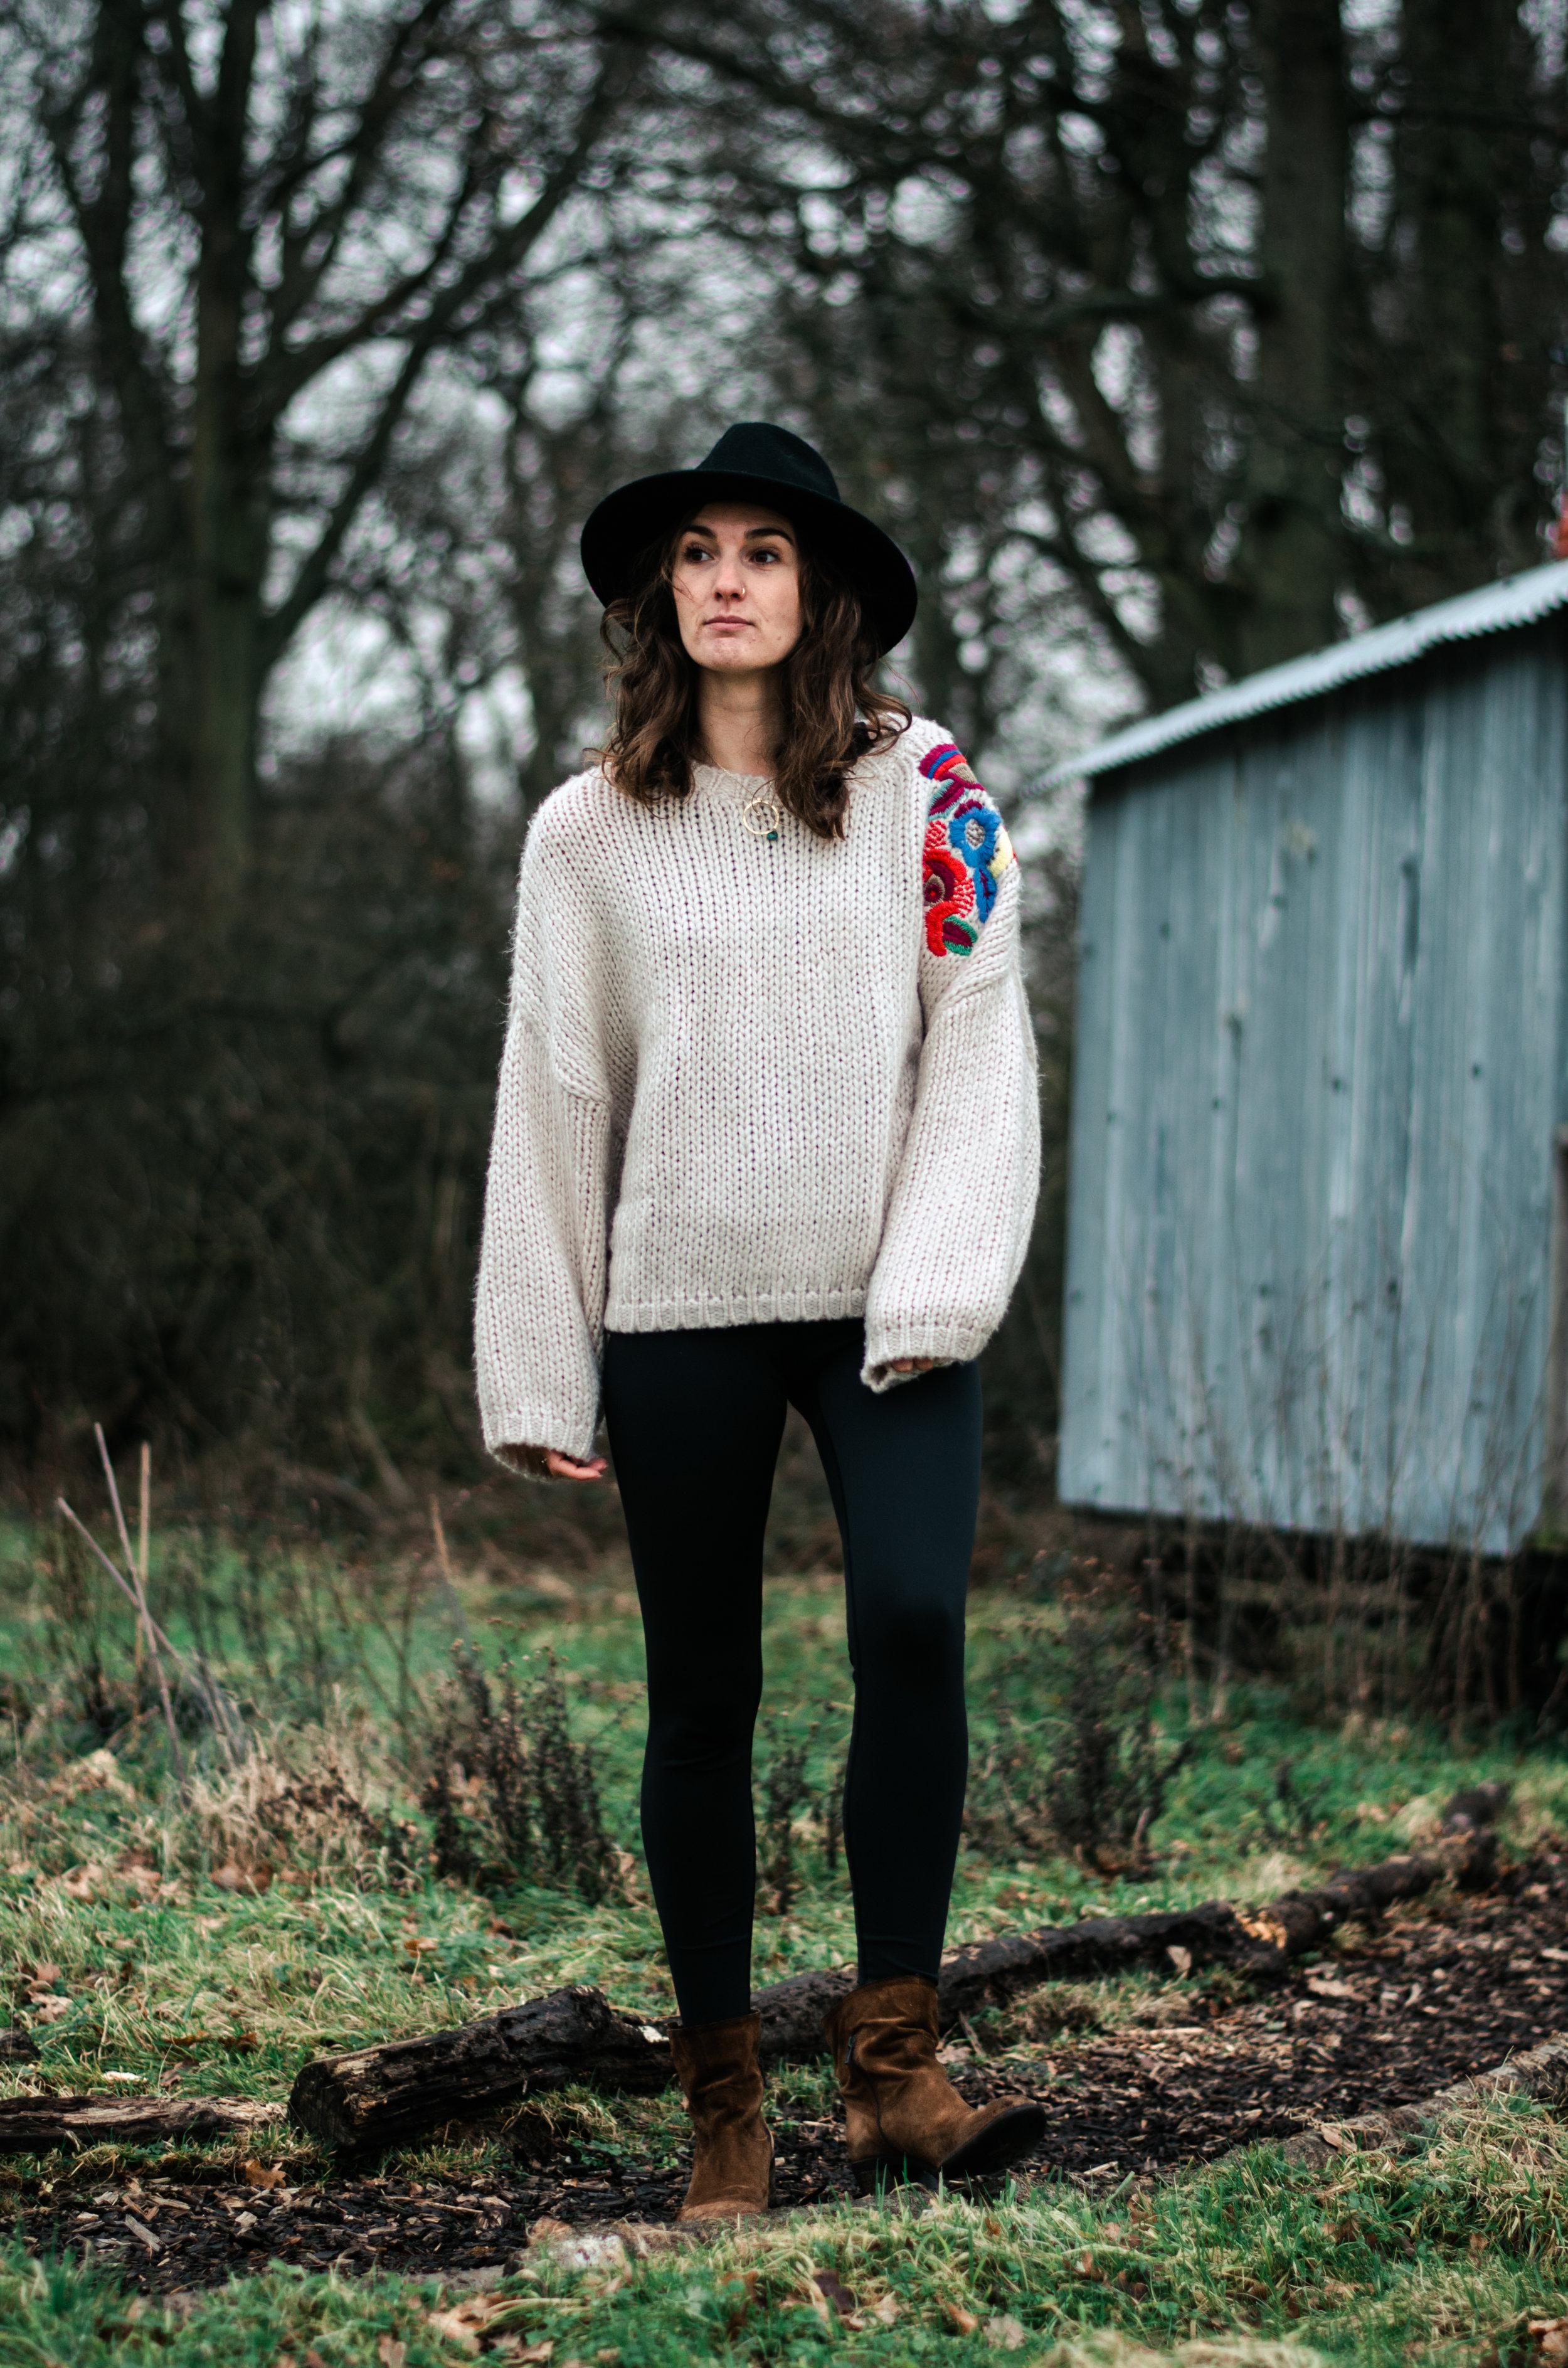 Chloe - Portraits - Aiste Saulyte Photography - 2018-01-05-94.jpg